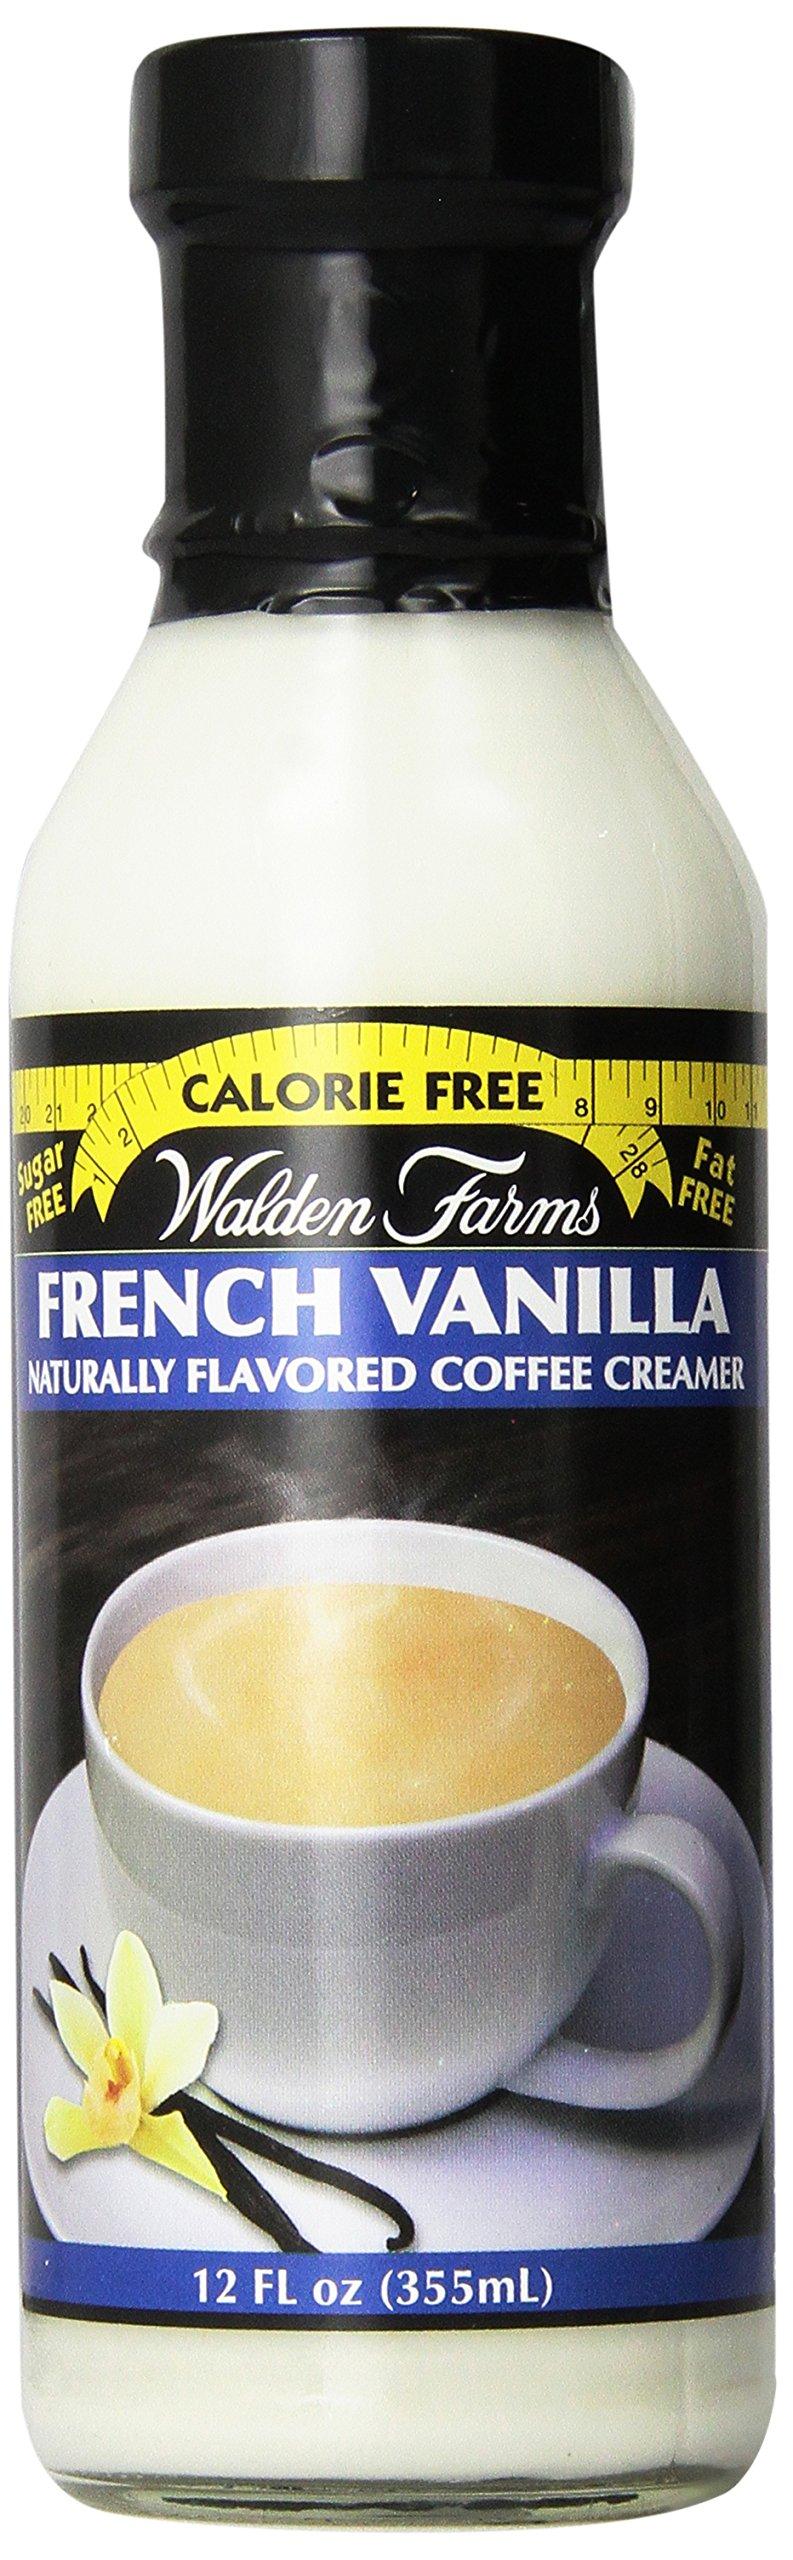 22+ Vanilla coffee creamer nutrition trends